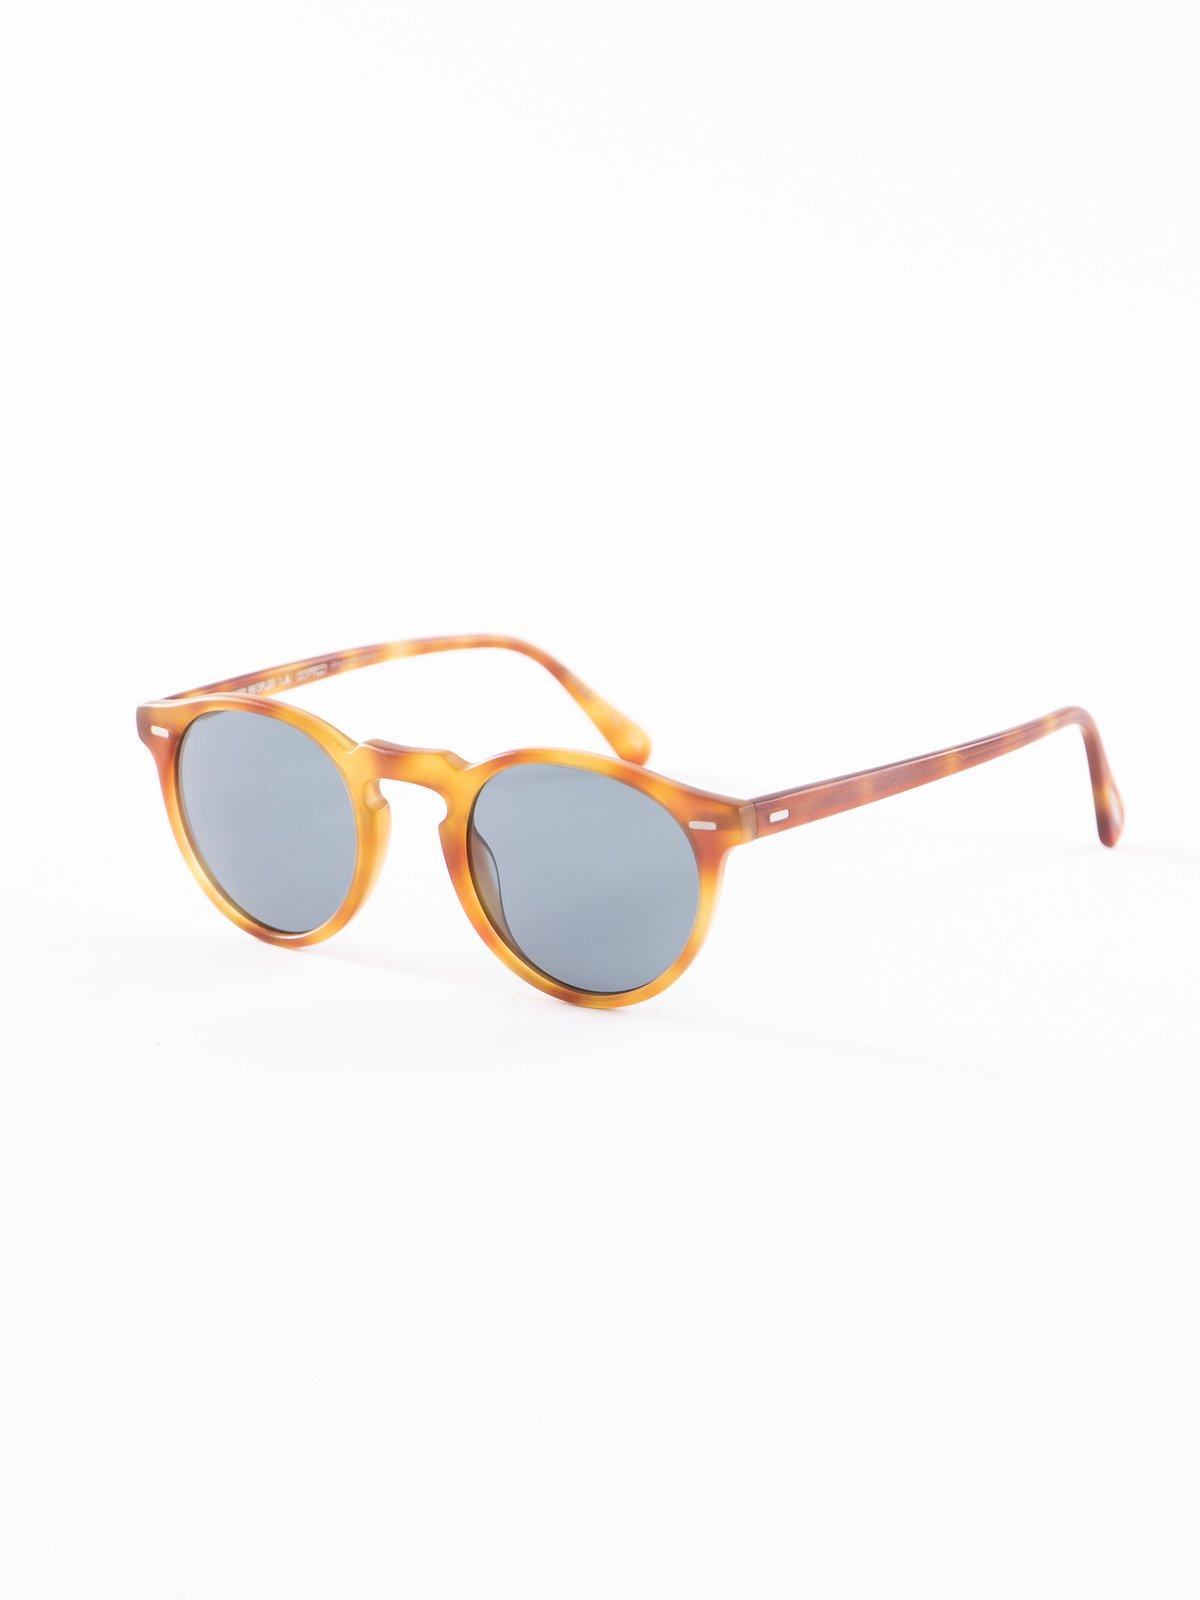 Semi–Matte LBR/Blue Photochromic Gregory Peck Sunglasses - Image 2